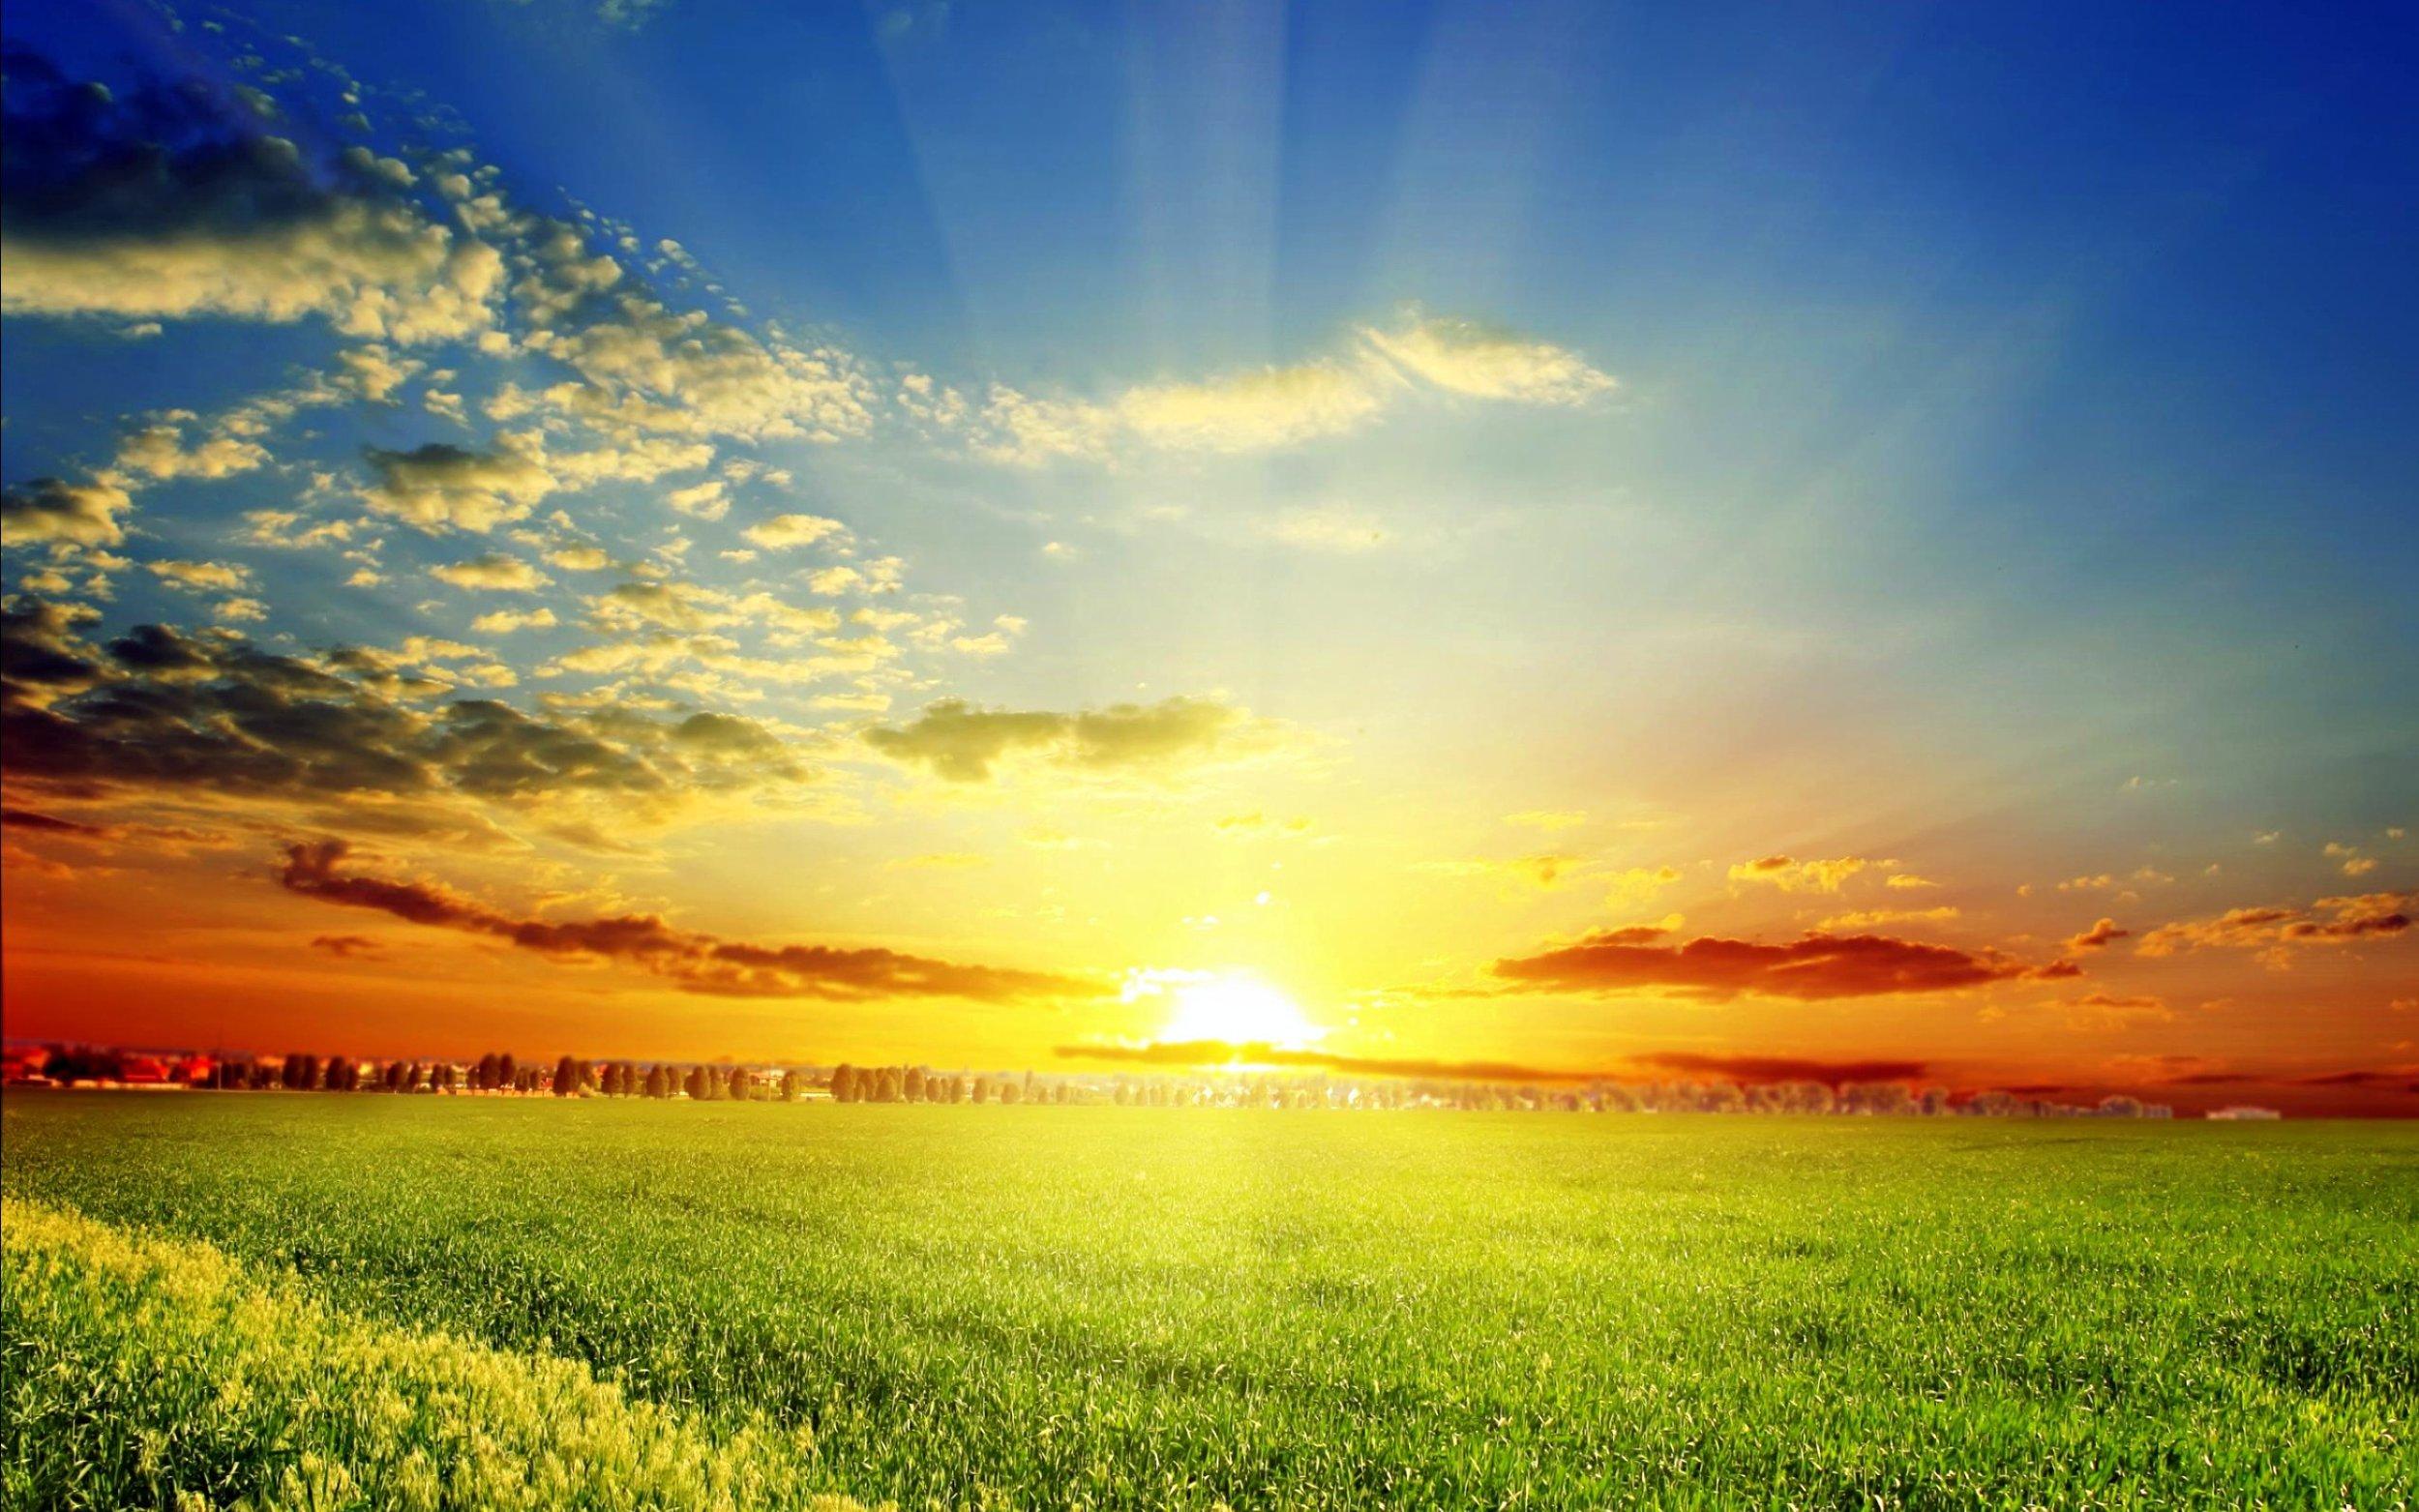 spring-sun-2560x1600-wallpaper.jpg